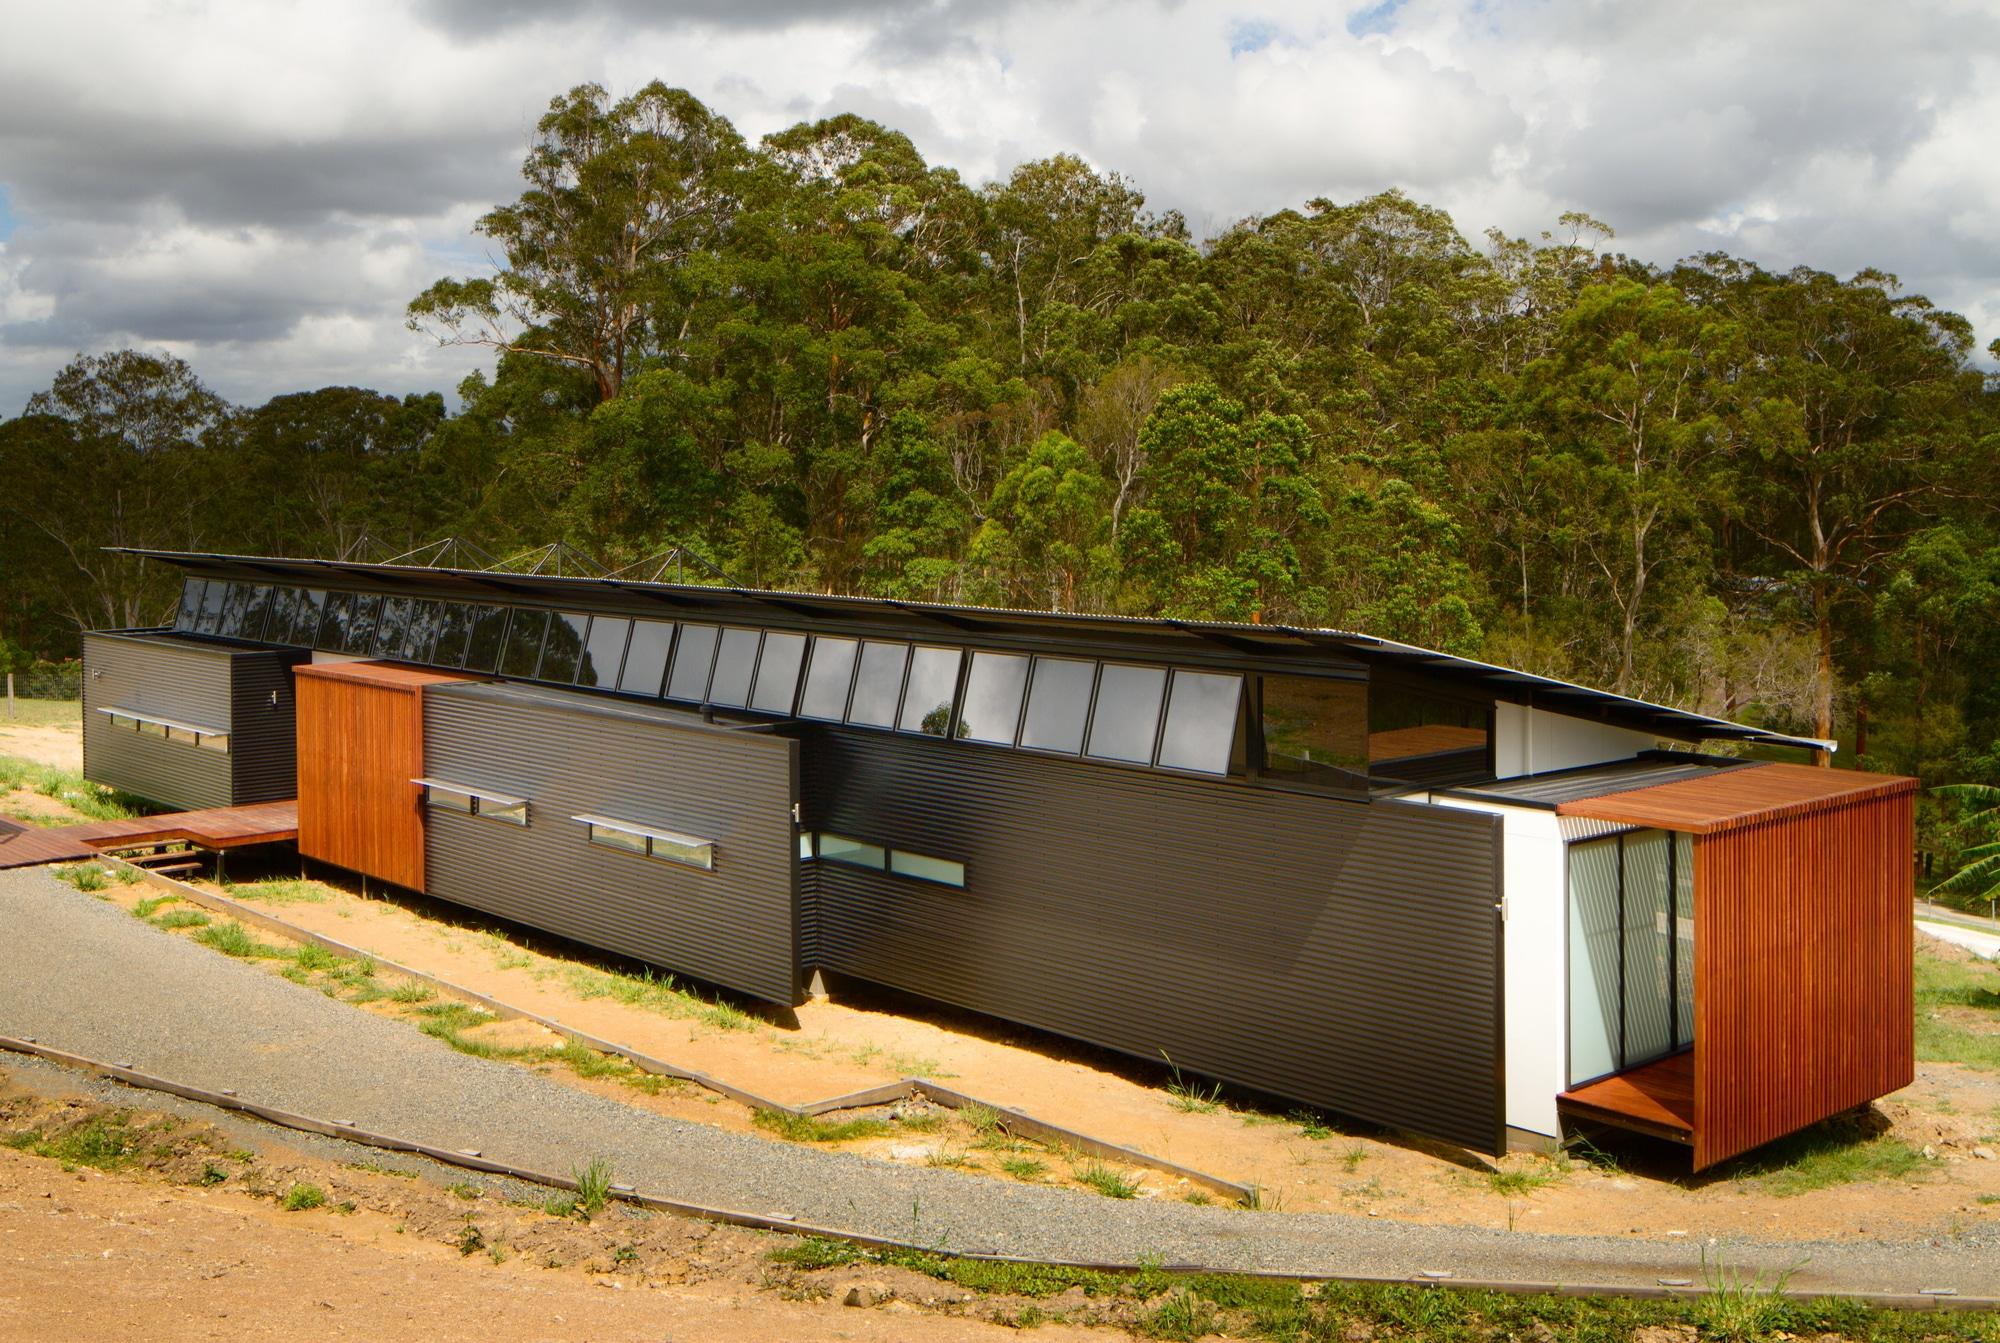 Dise o de casa moderna en terreno largo y angosto - Planos de casas alargadas ...